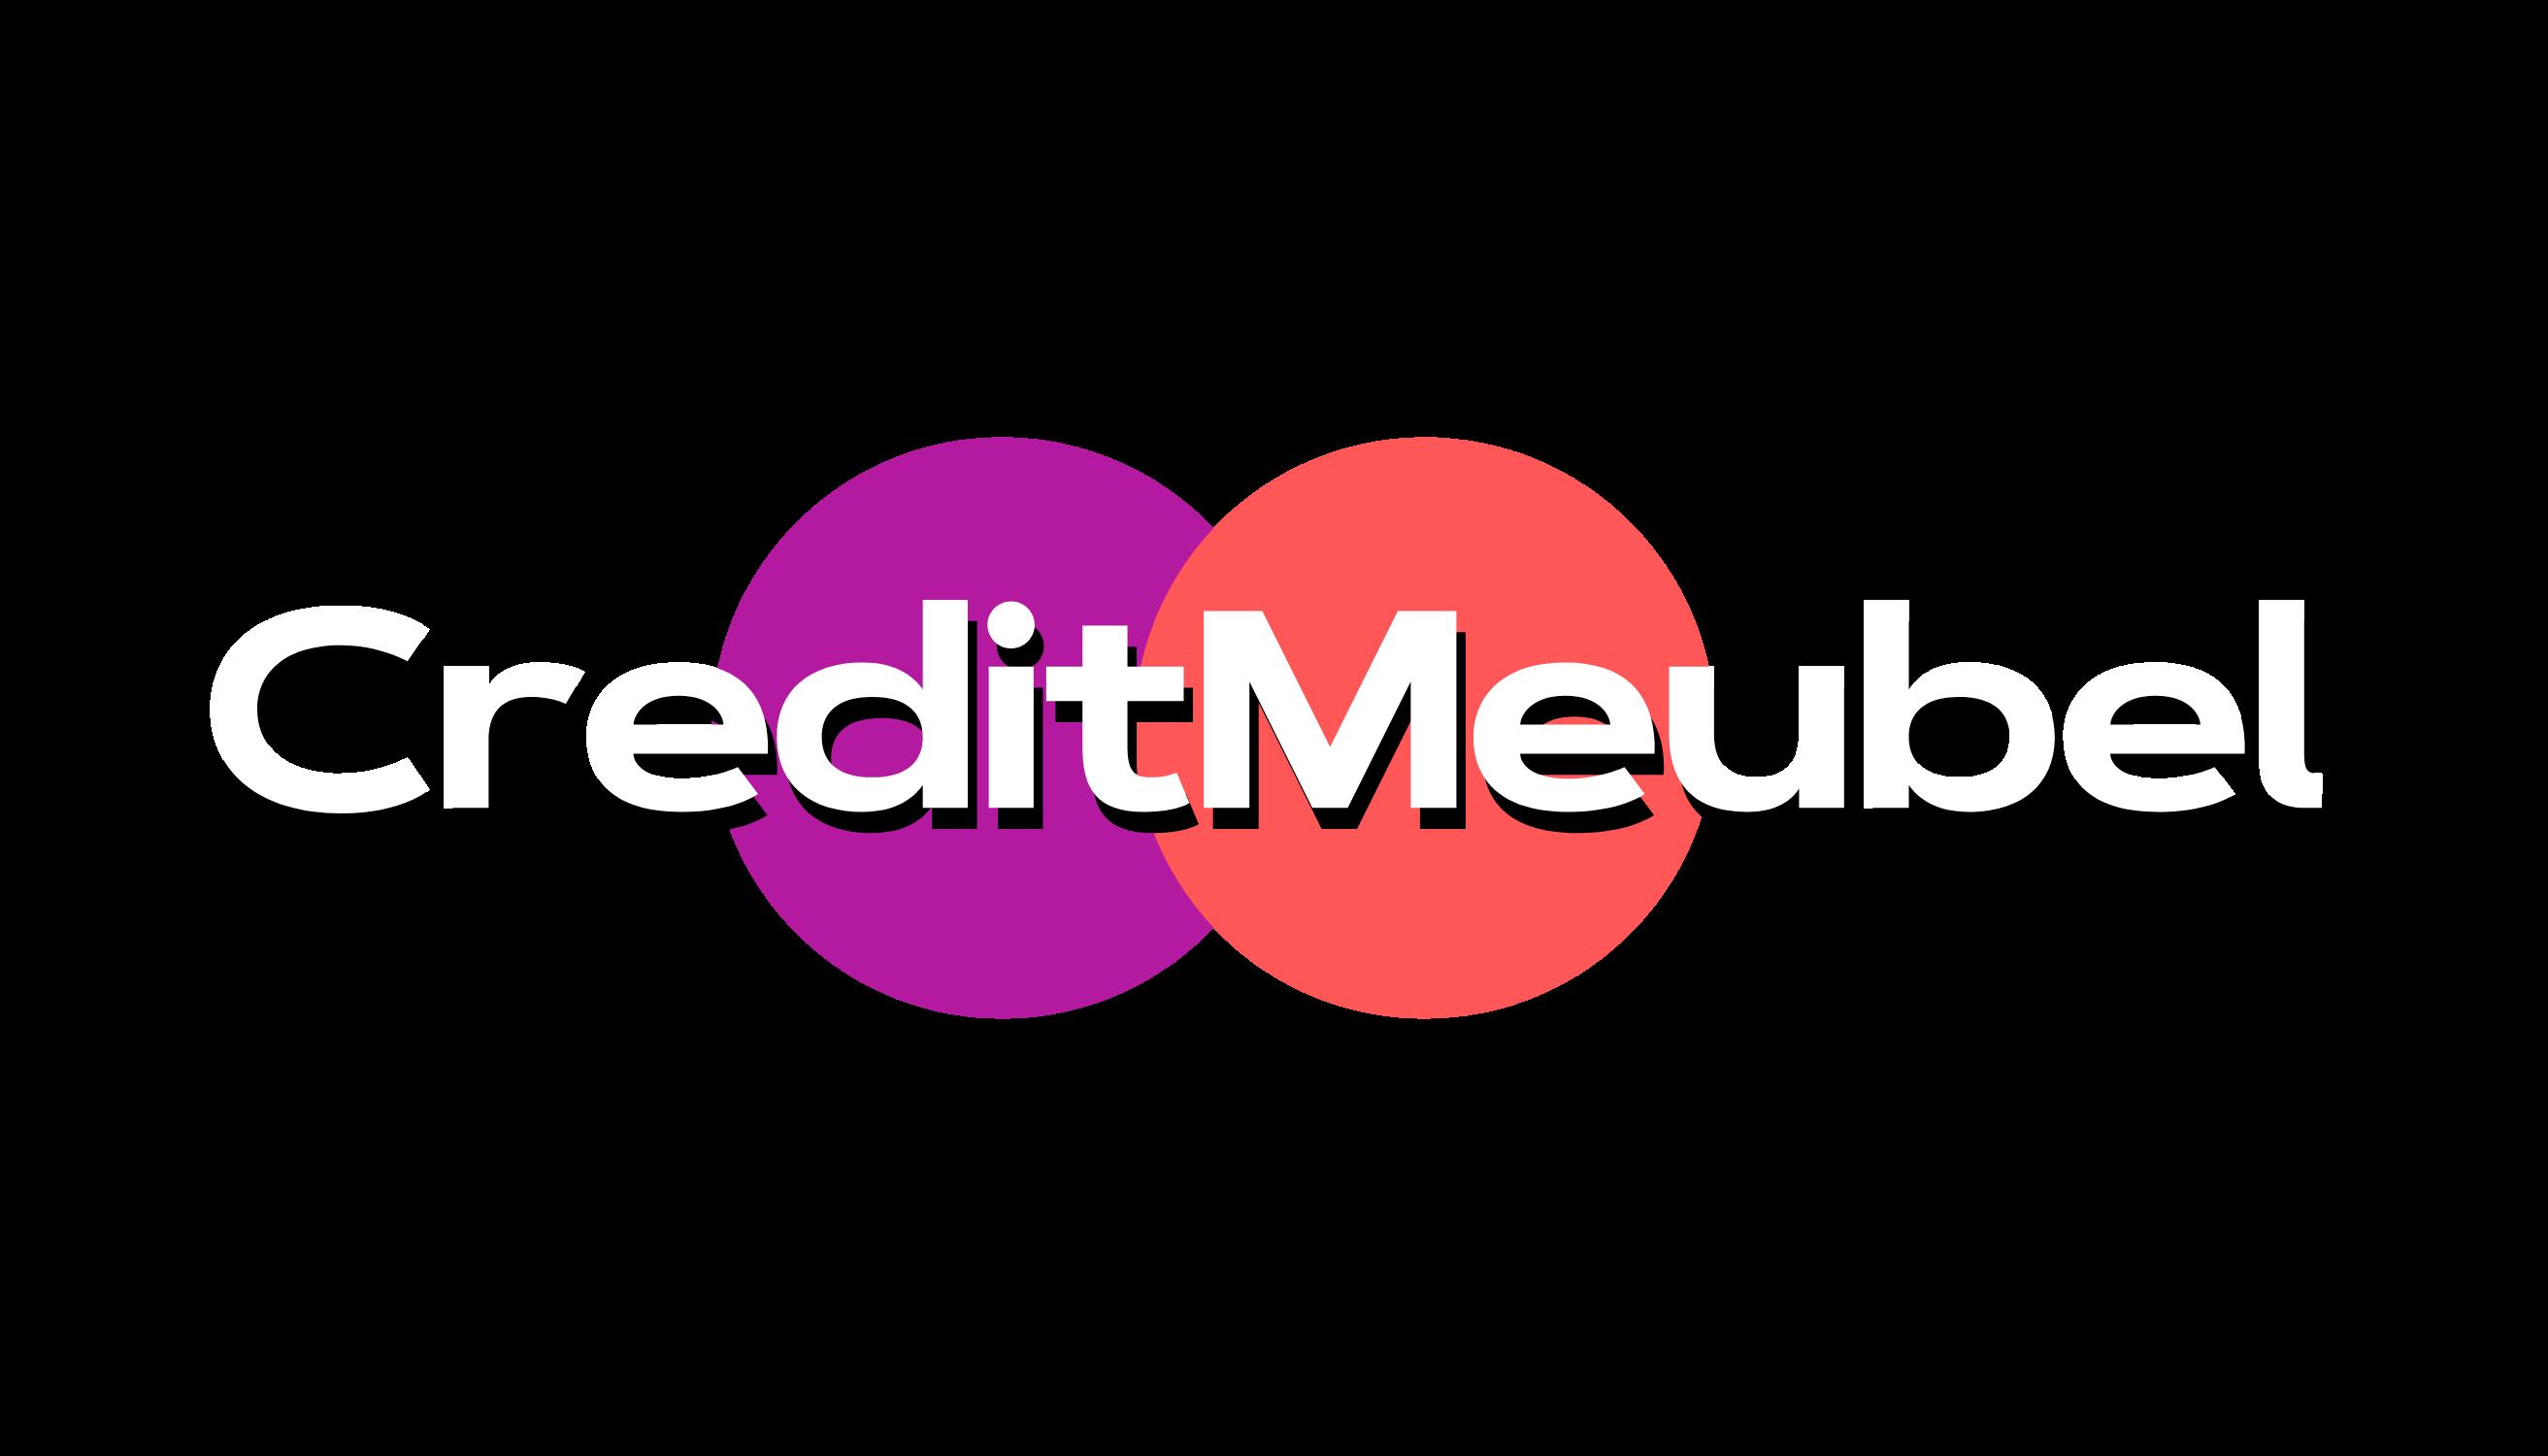 CreditMeubel.nl